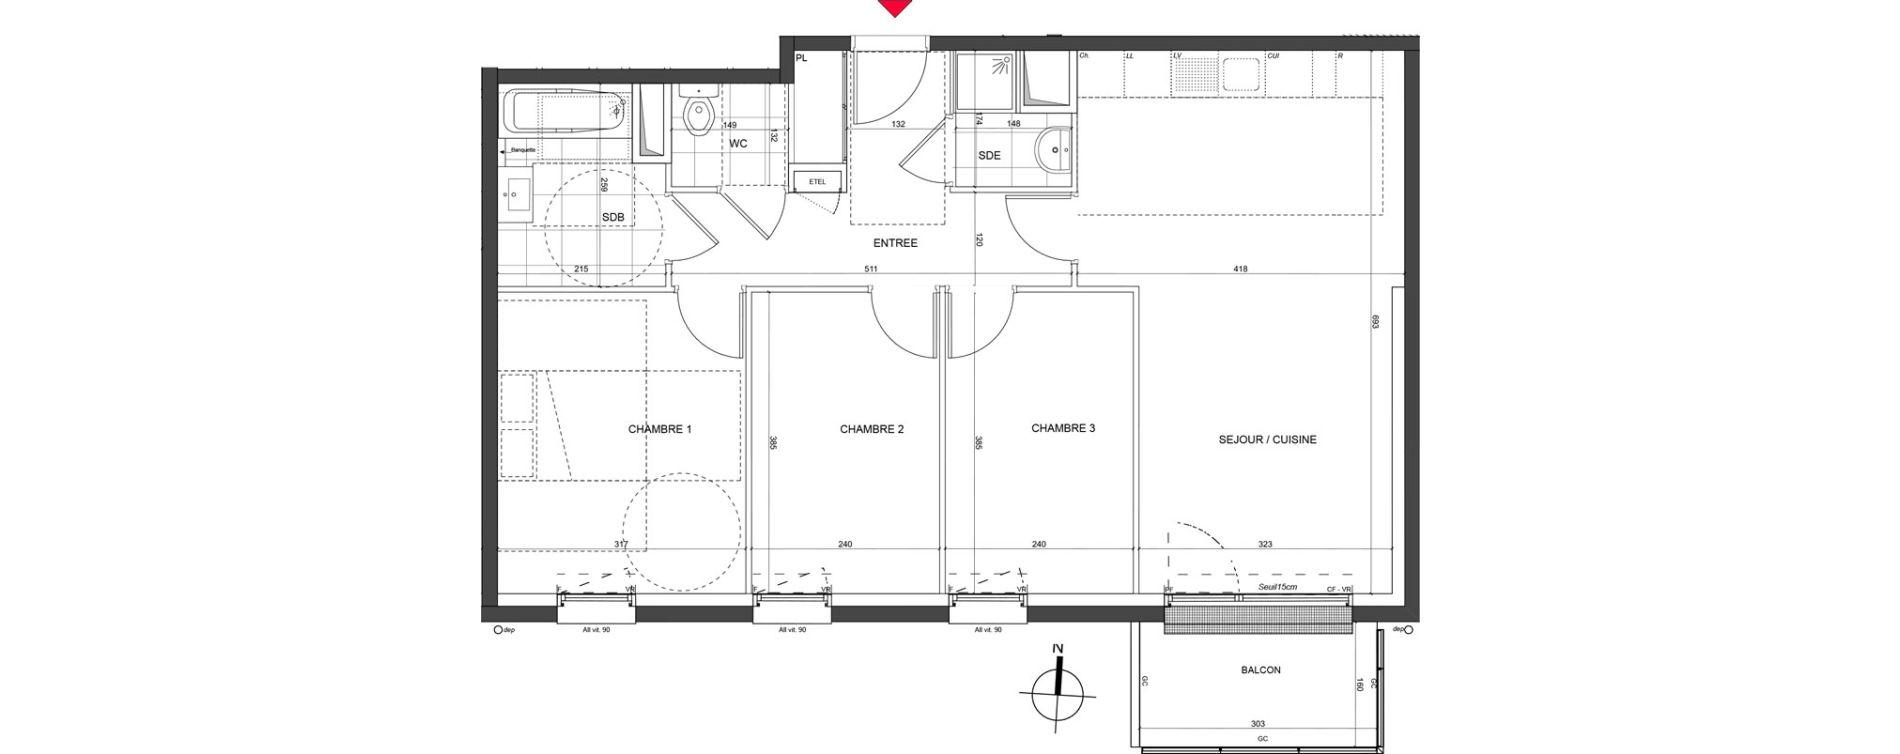 Appartement T4 de 74,49 m2 à Nancy Charles iii